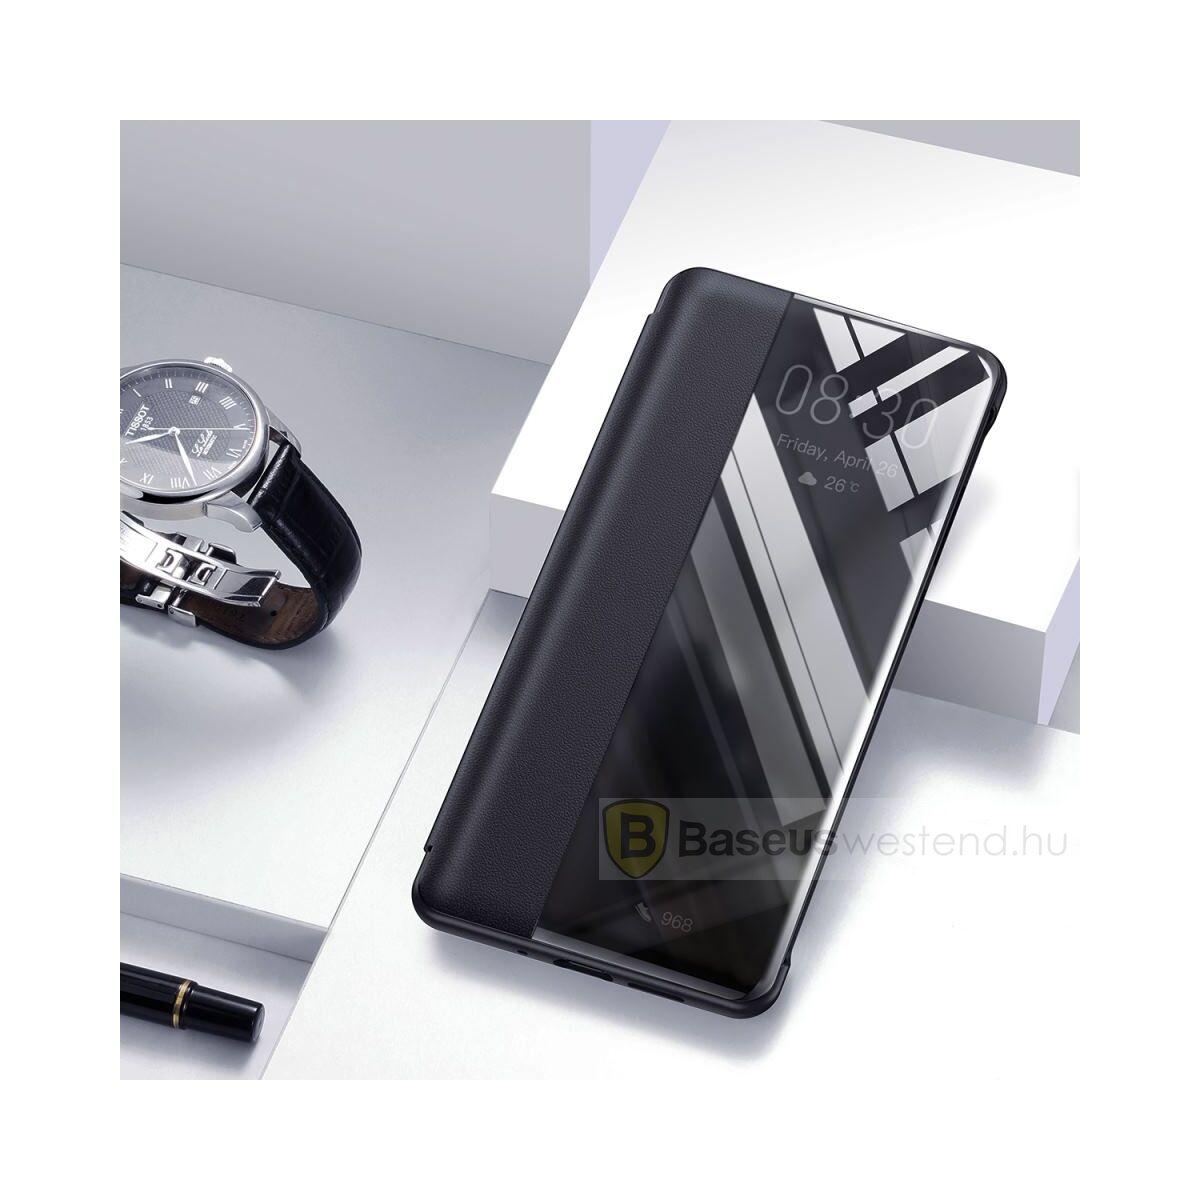 Baseus Huawei P30 Original Intelligent Window kihajtható, flip tok, fekete (LTHWP30-YP01)